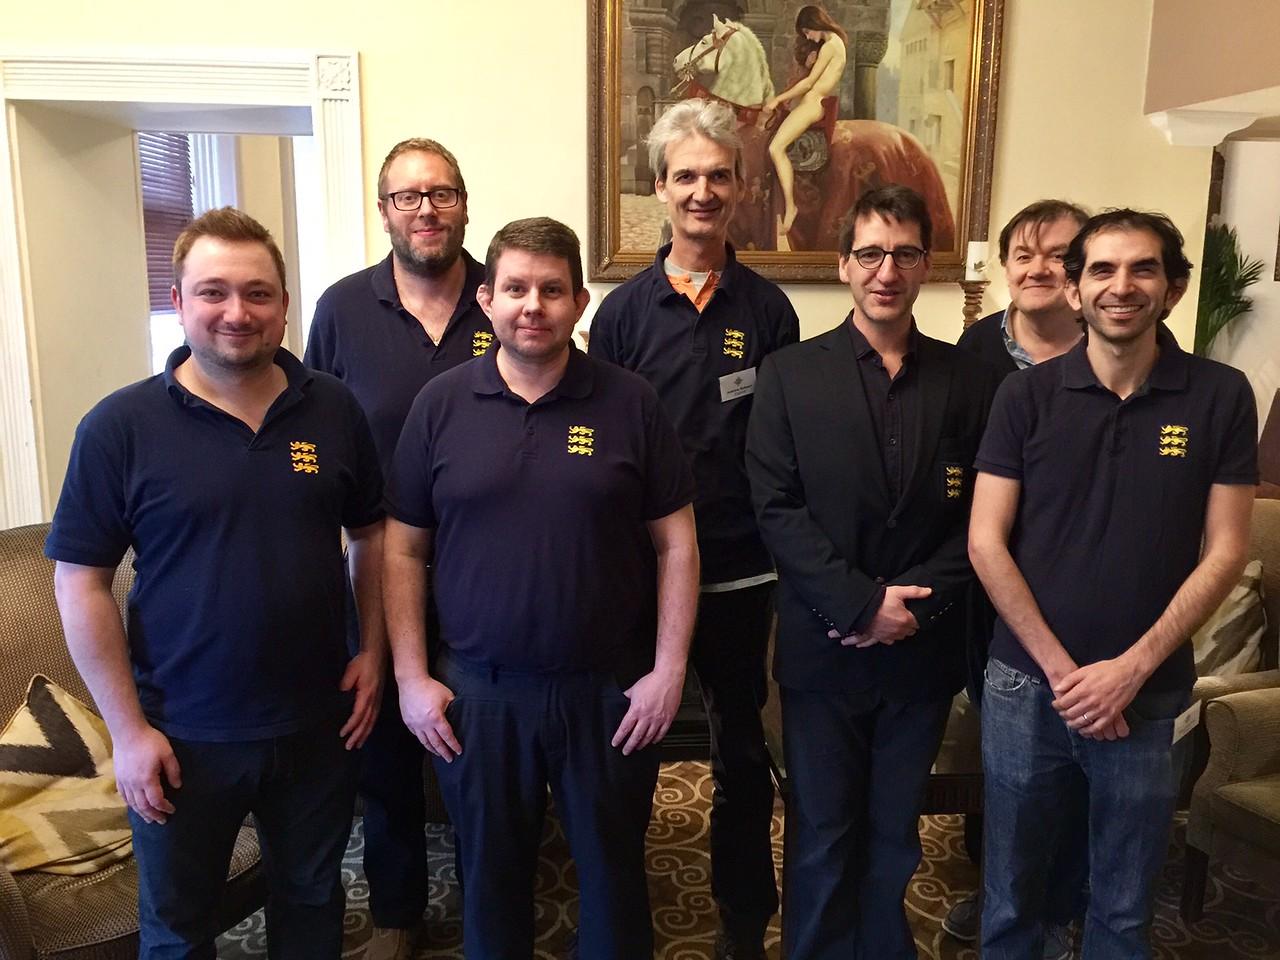 England team, Mike Bell, David Gold, Martin jones (NPC), Andrew Robson, Alexander Allfrey, Tony Forrester, David Bakhshi